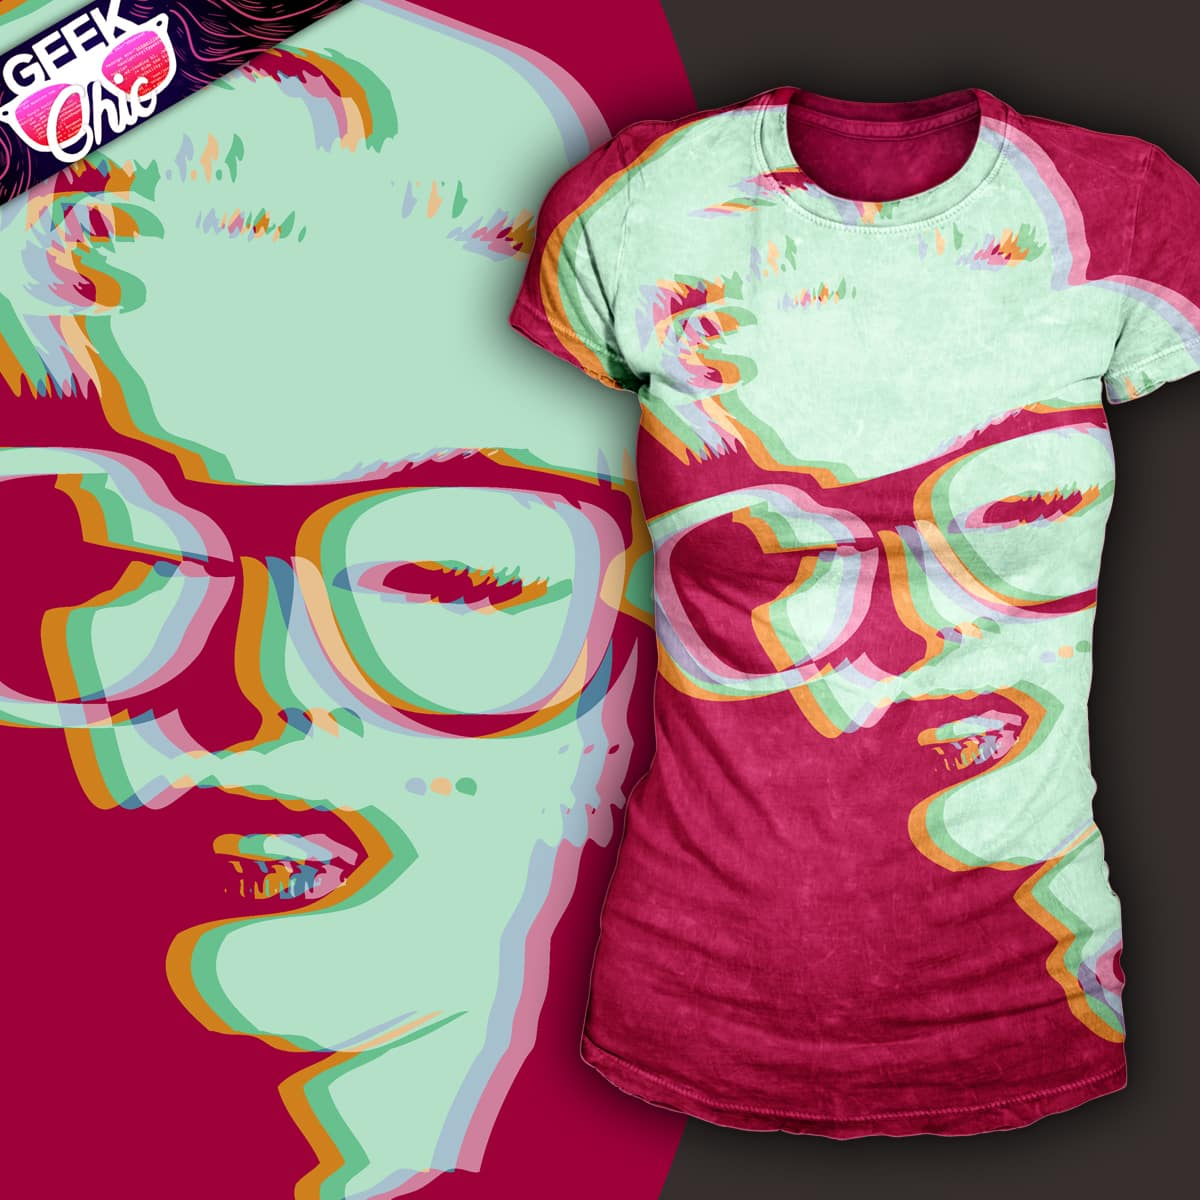 Geek Monroe by jolu27 on Threadless